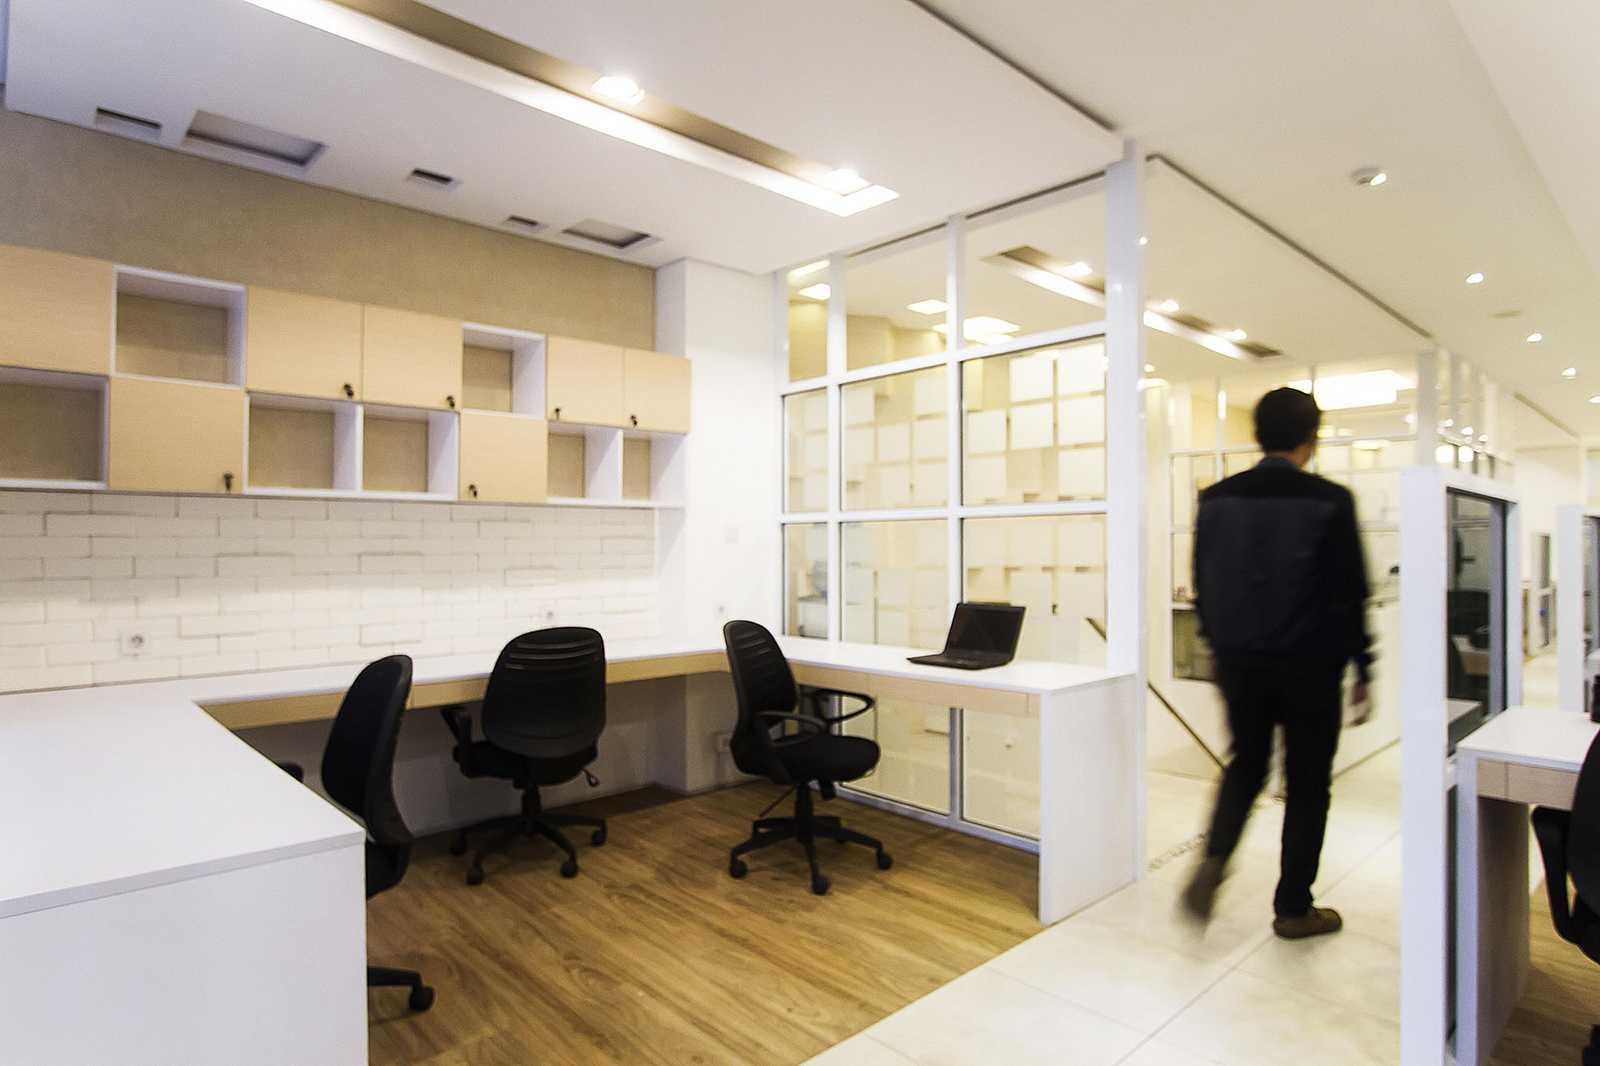 Delution Bpb Office Jl. Deplu Raya No.8, Rt.3/rw.3, Bintaro, Pesanggrahan, Kota Jakarta Selatan, Daerah Khusus Ibukota Jakarta 12330, Indonesia Jakarta, Indonesia Employee-Area Modern  12521